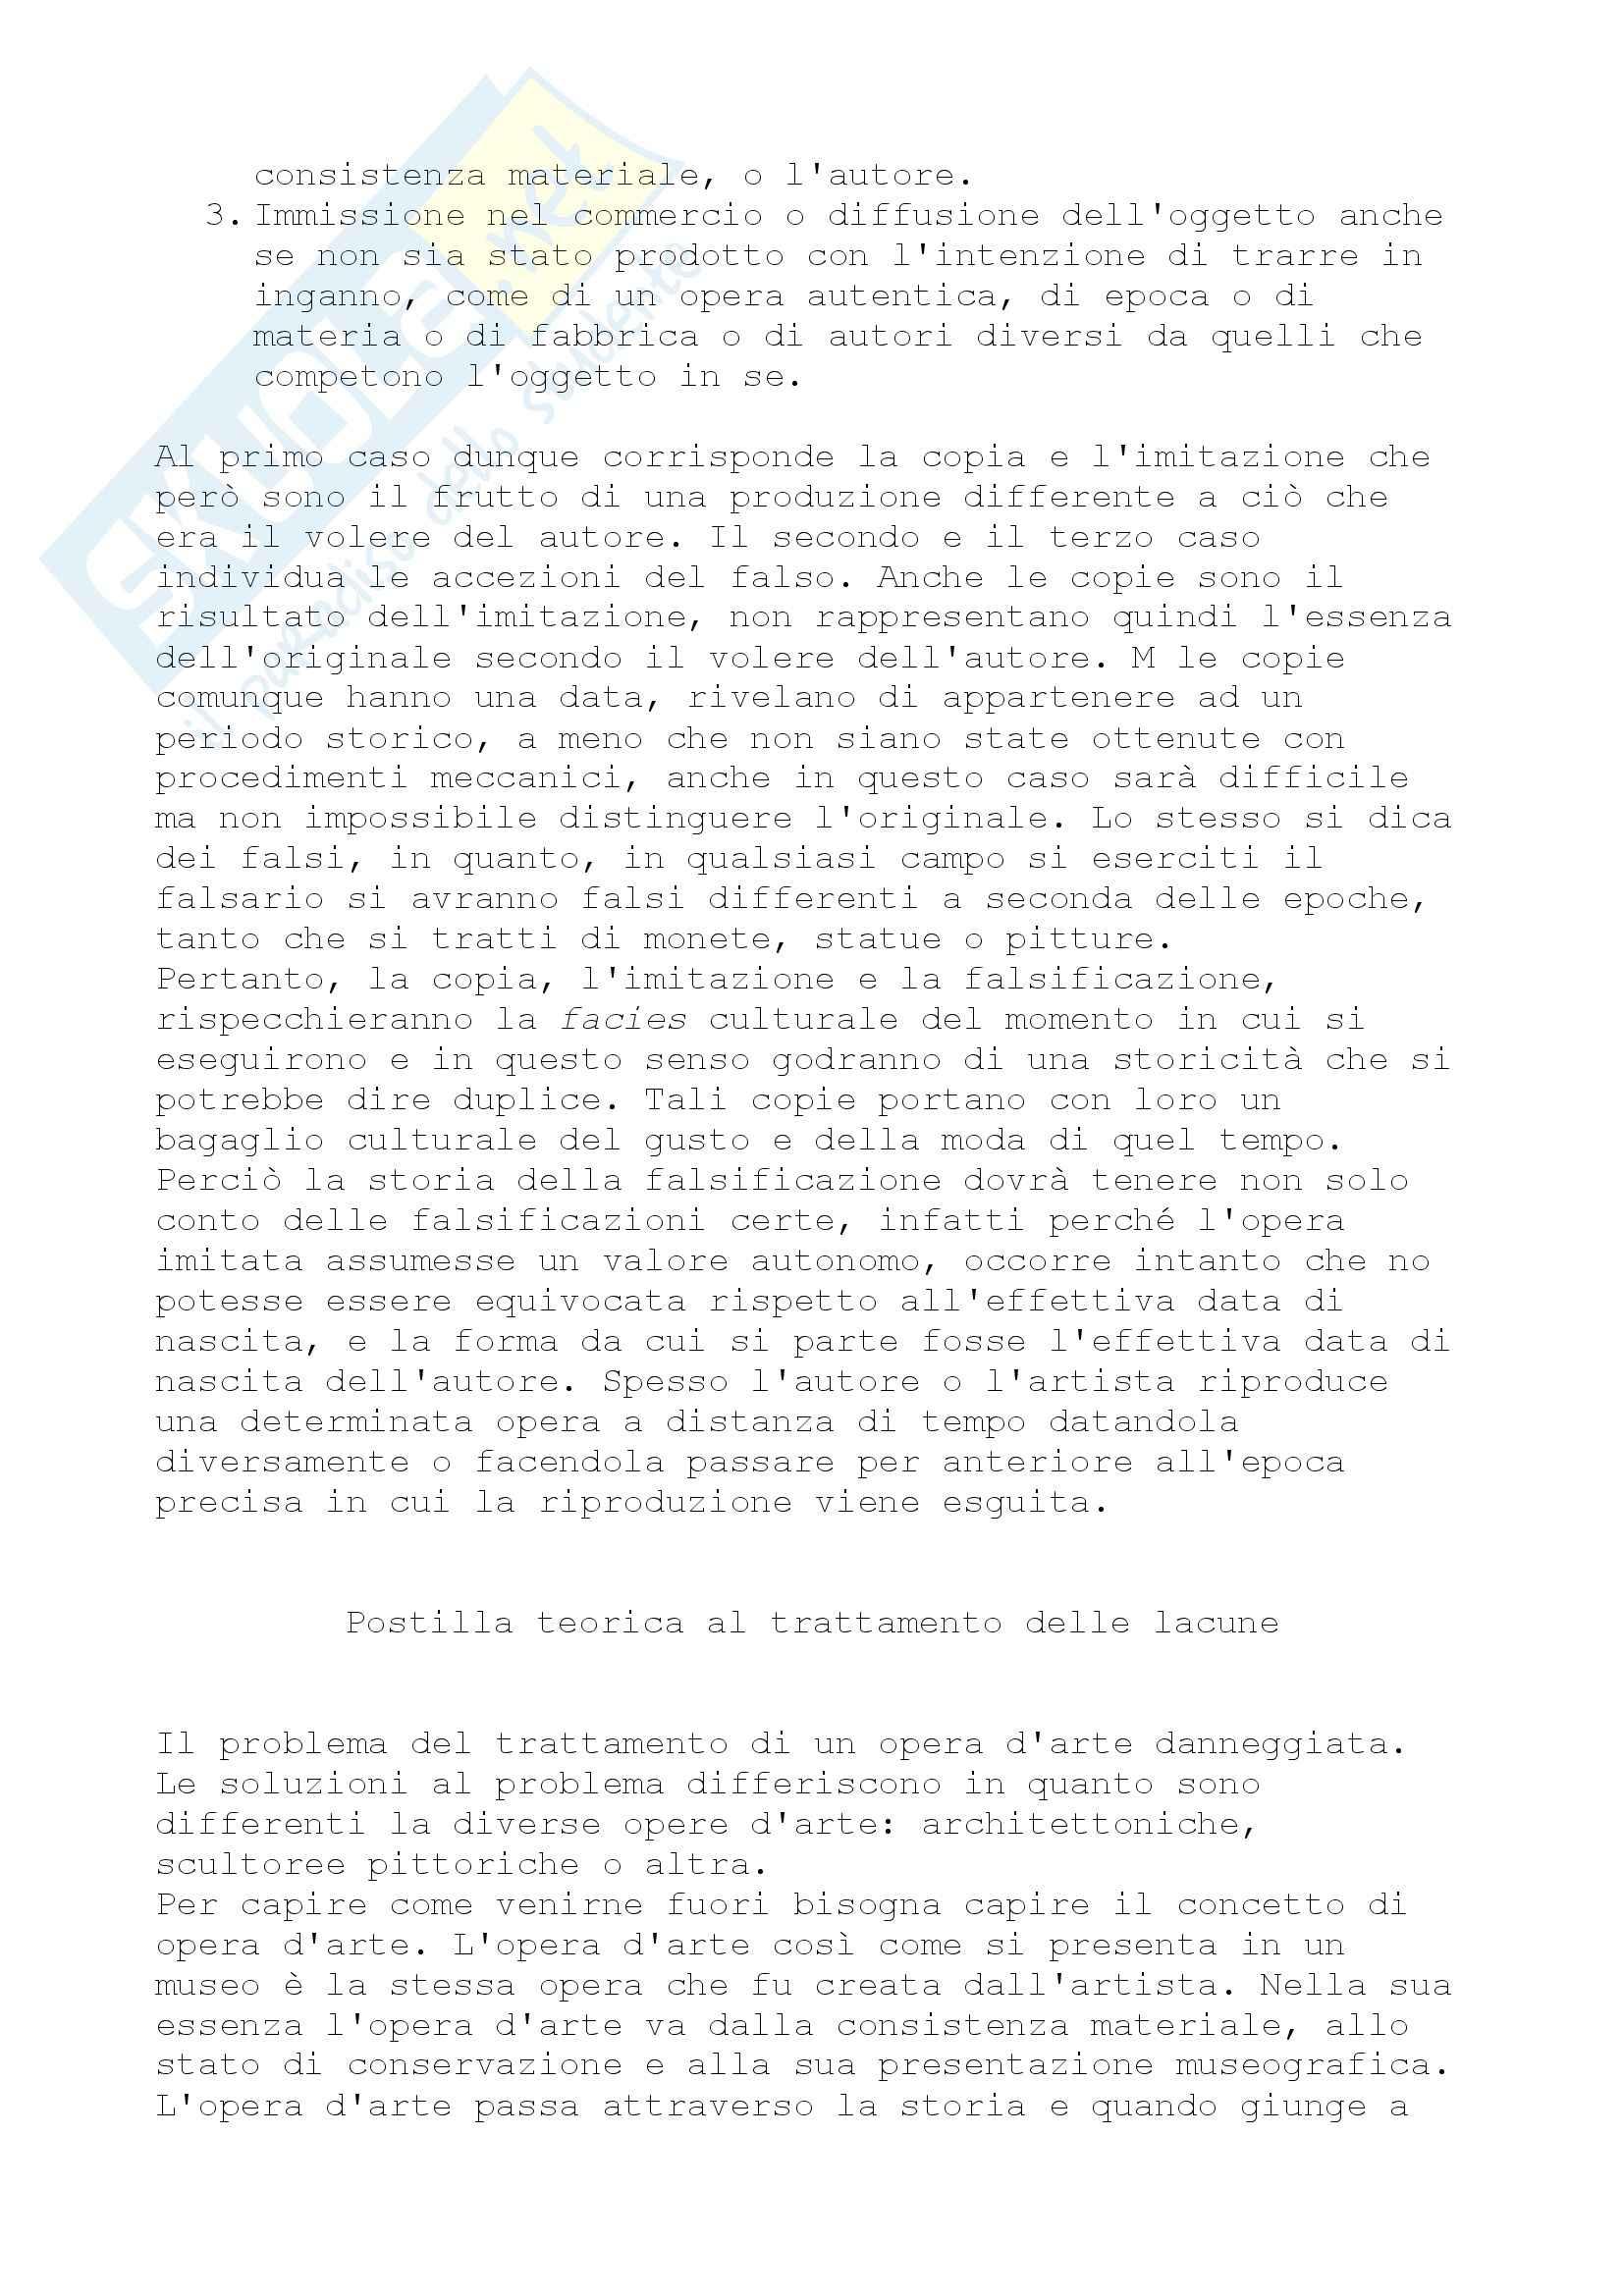 Metodologie della ricerca archeologica - Appunti Pag. 11